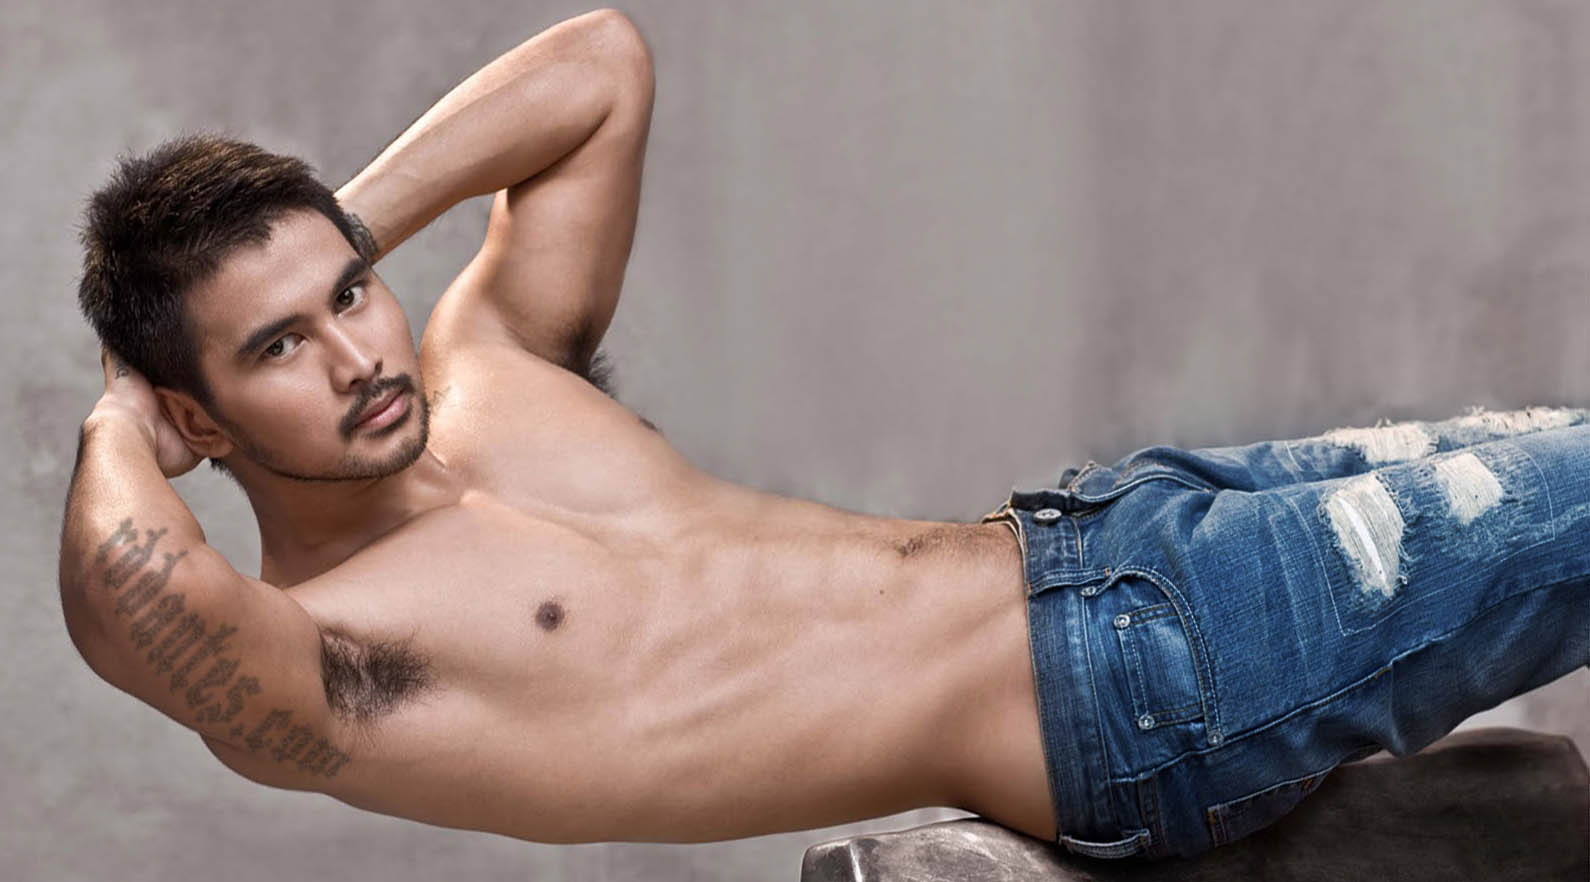 Pinoy nude sexy men — 7